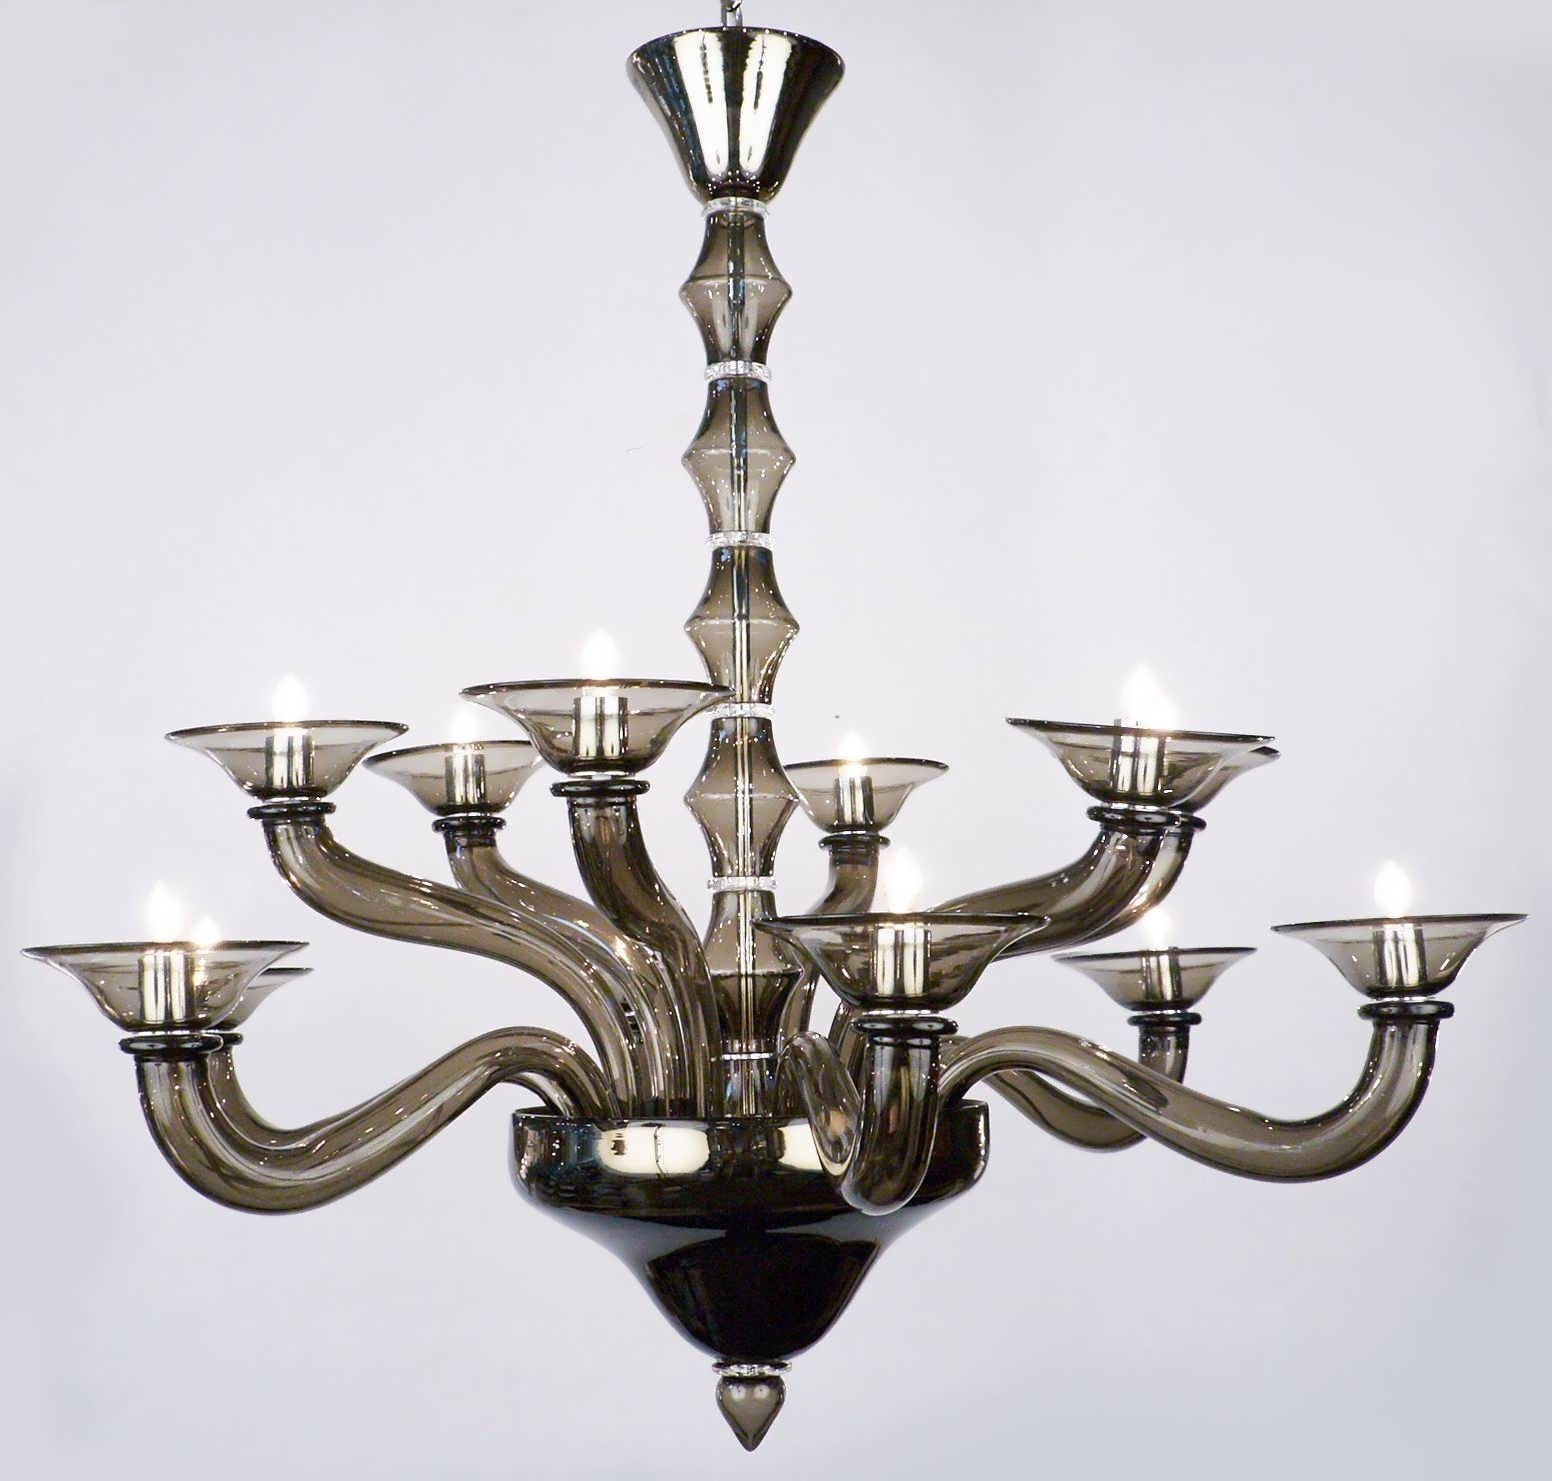 Chandeliers Design : Magnificent Blown Glass Chandelier Drum With Latest Modern Italian Chandeliers (View 14 of 15)